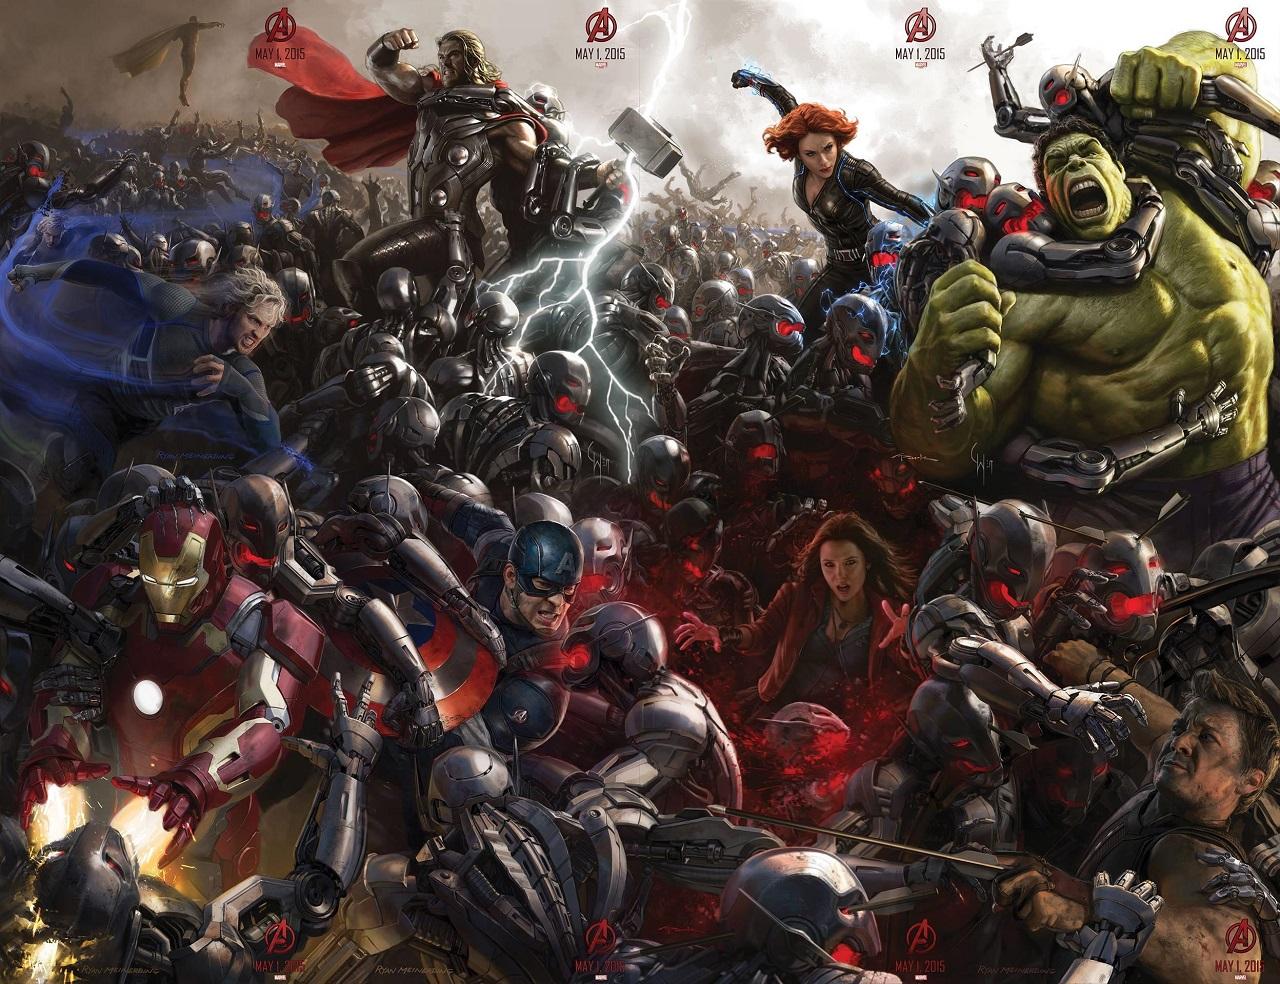 Avengers - Age of Ultron di Joss Whedon - 02